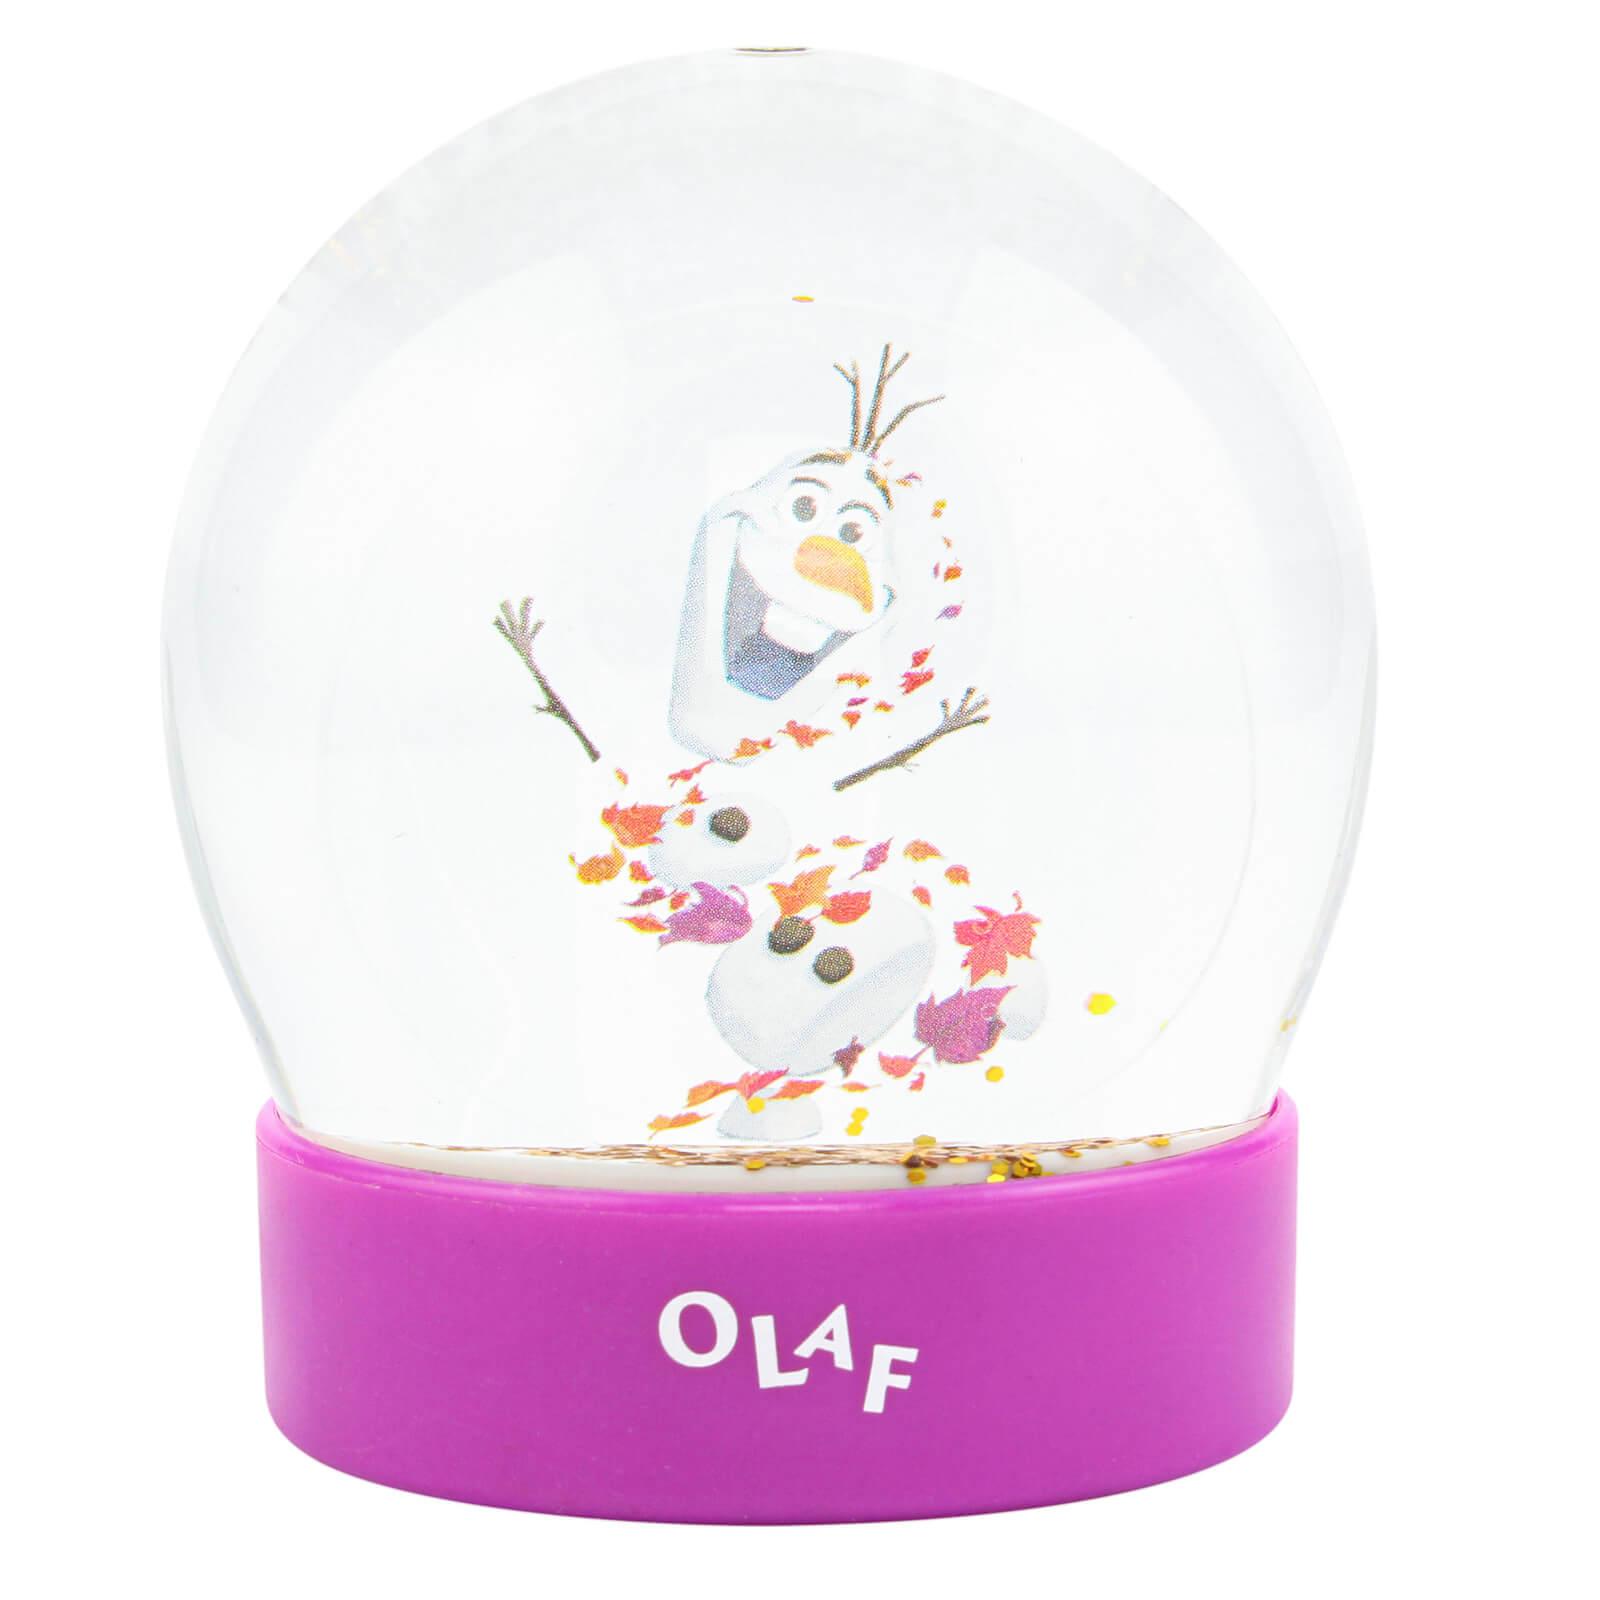 Image of Frozen 2 Snow Globe